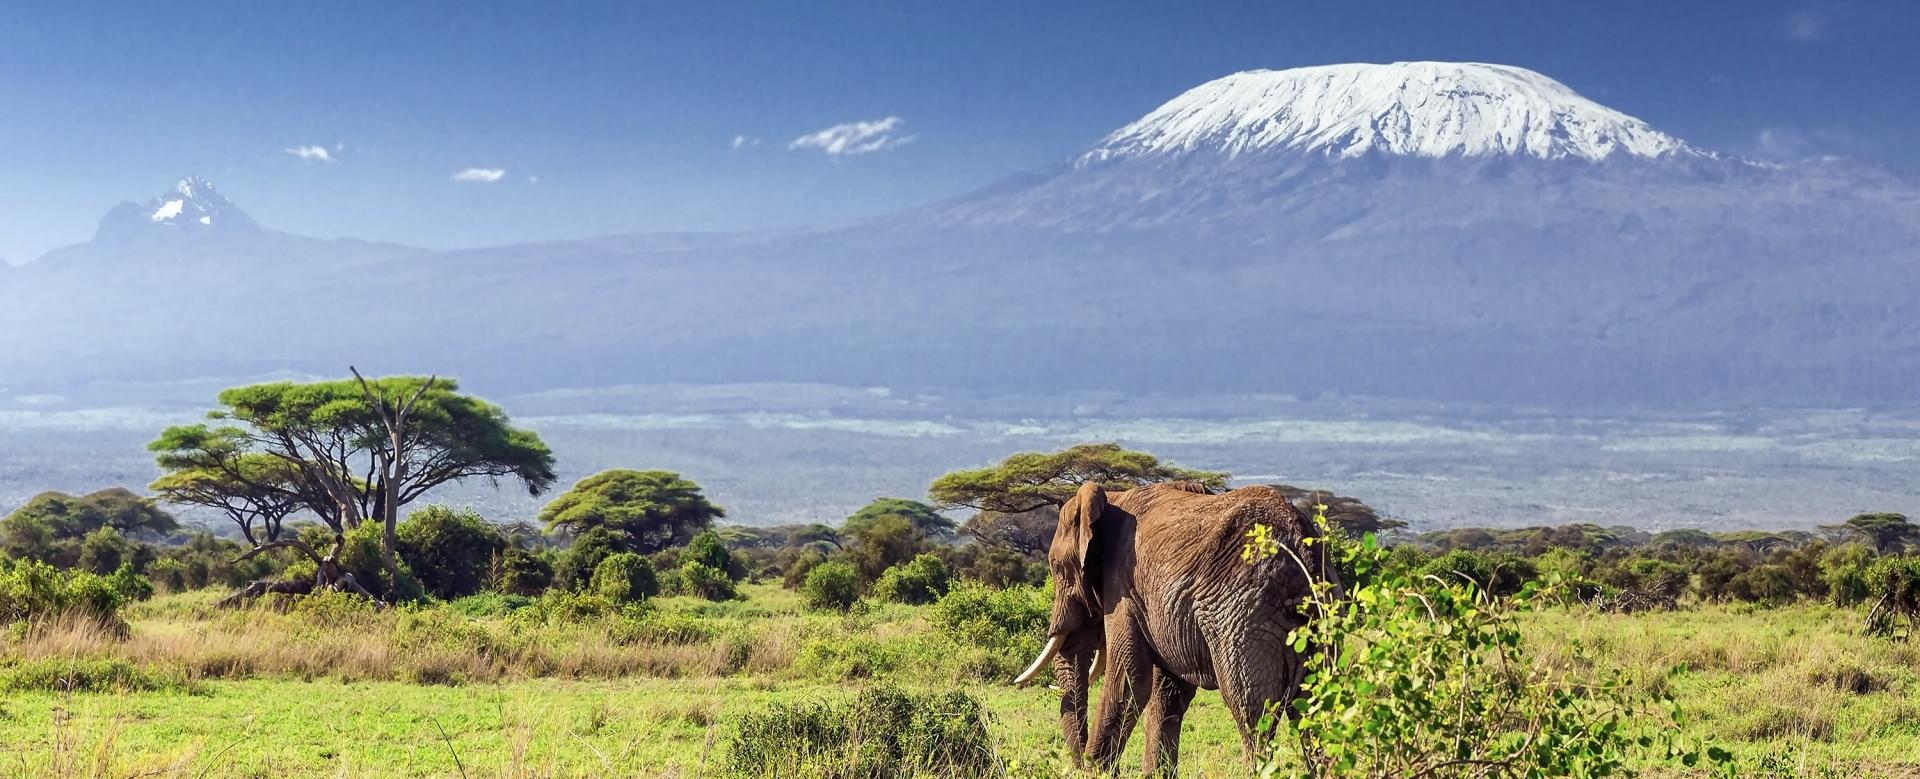 Trekking kilimandjaro - Traversée et ascension du Kilimandjaro - Trekking -  Tanzanie - Allibert Trekking